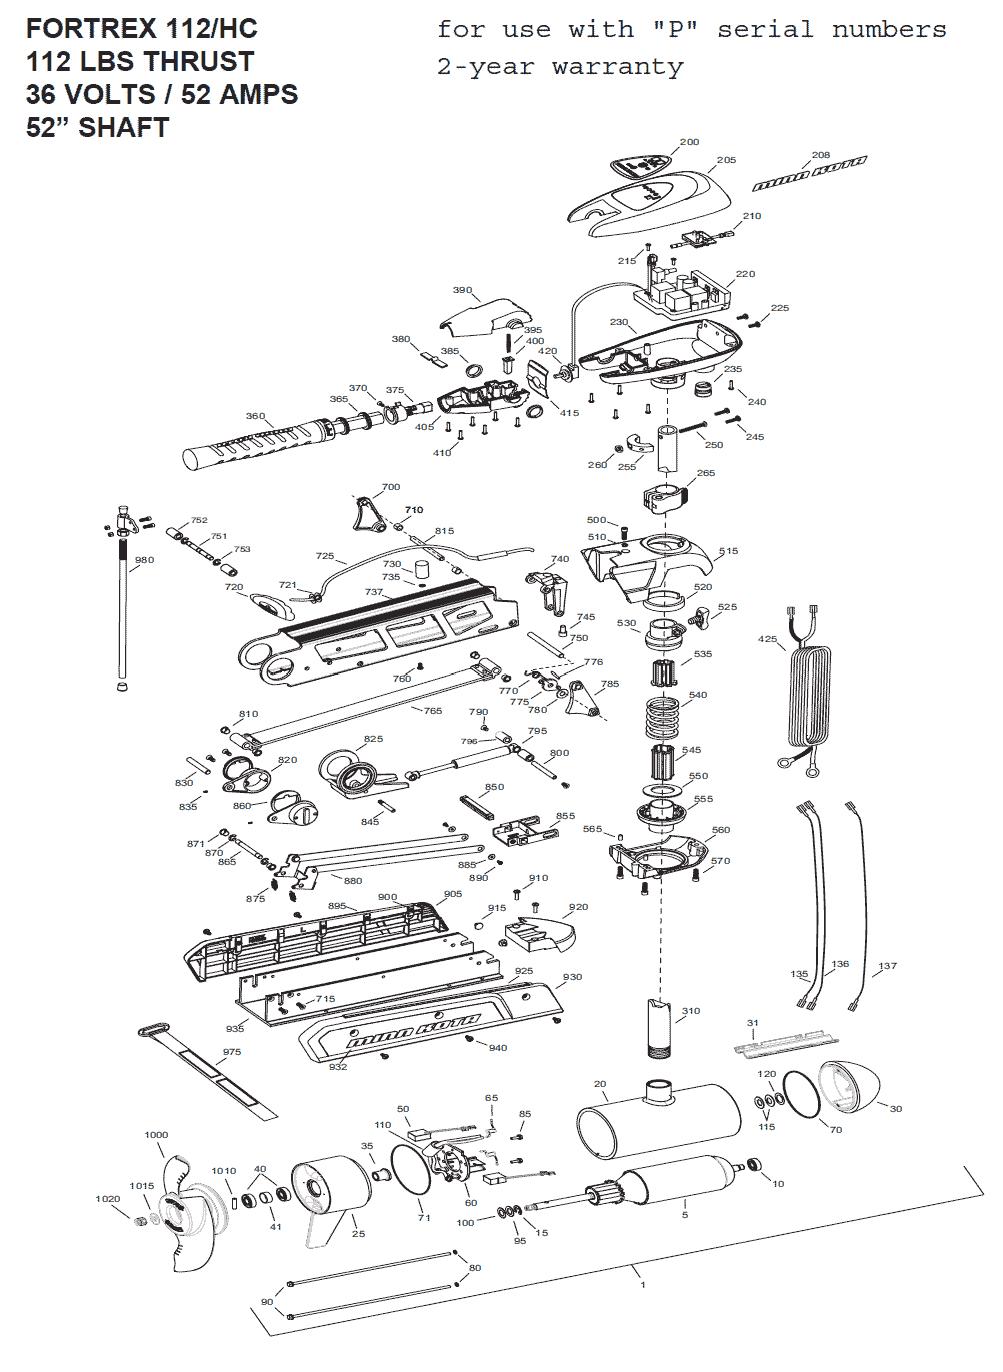 Minn Kota Vantage Wiring Diagram 36 Volt Battery Minn Kota